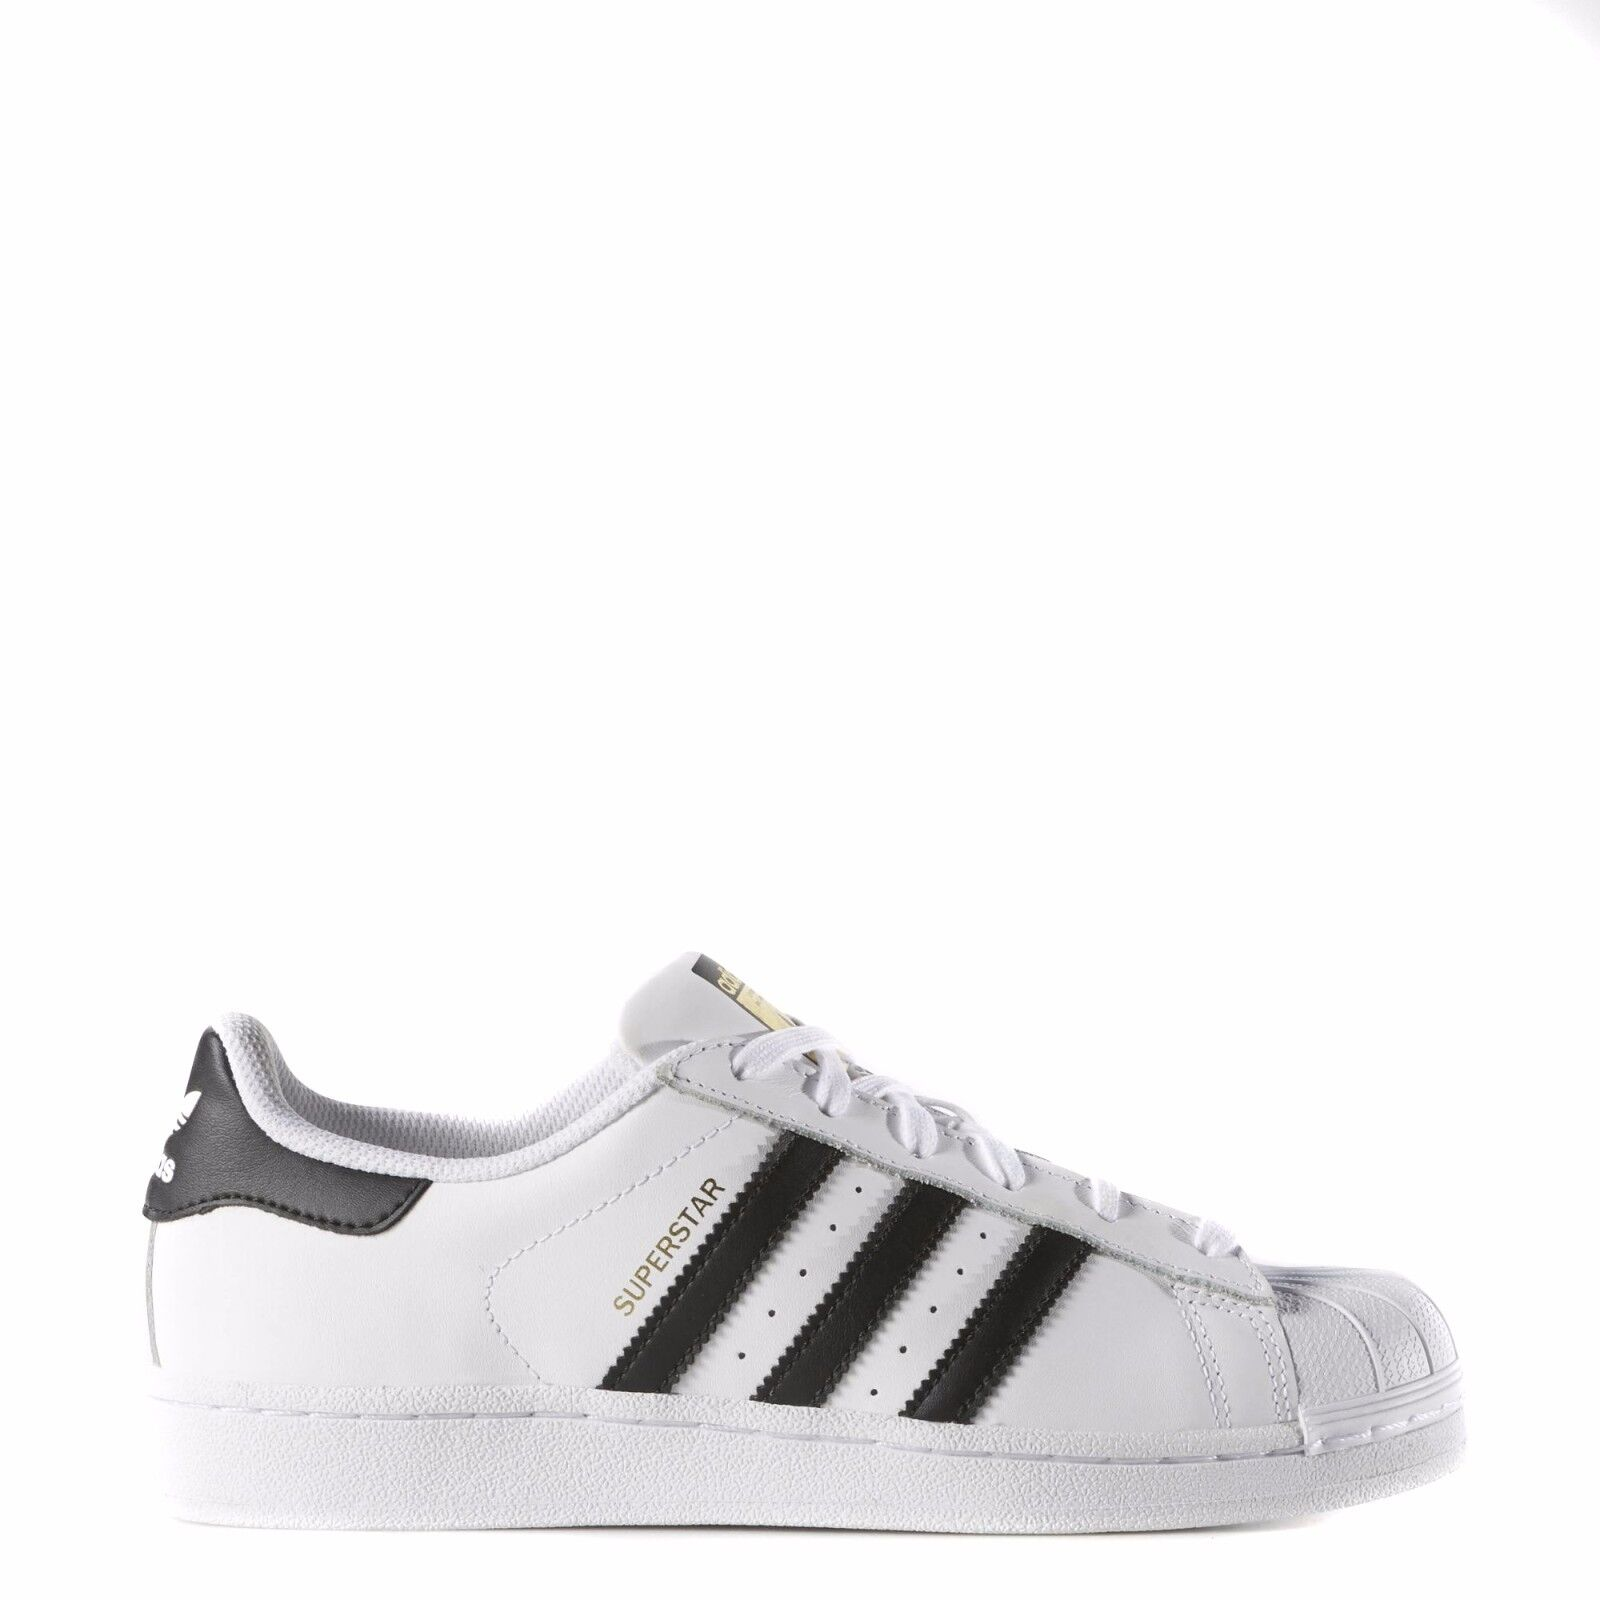 Adidas Originals Women's Superstar Shoes NEW AUTHENTIC White/Black C77153